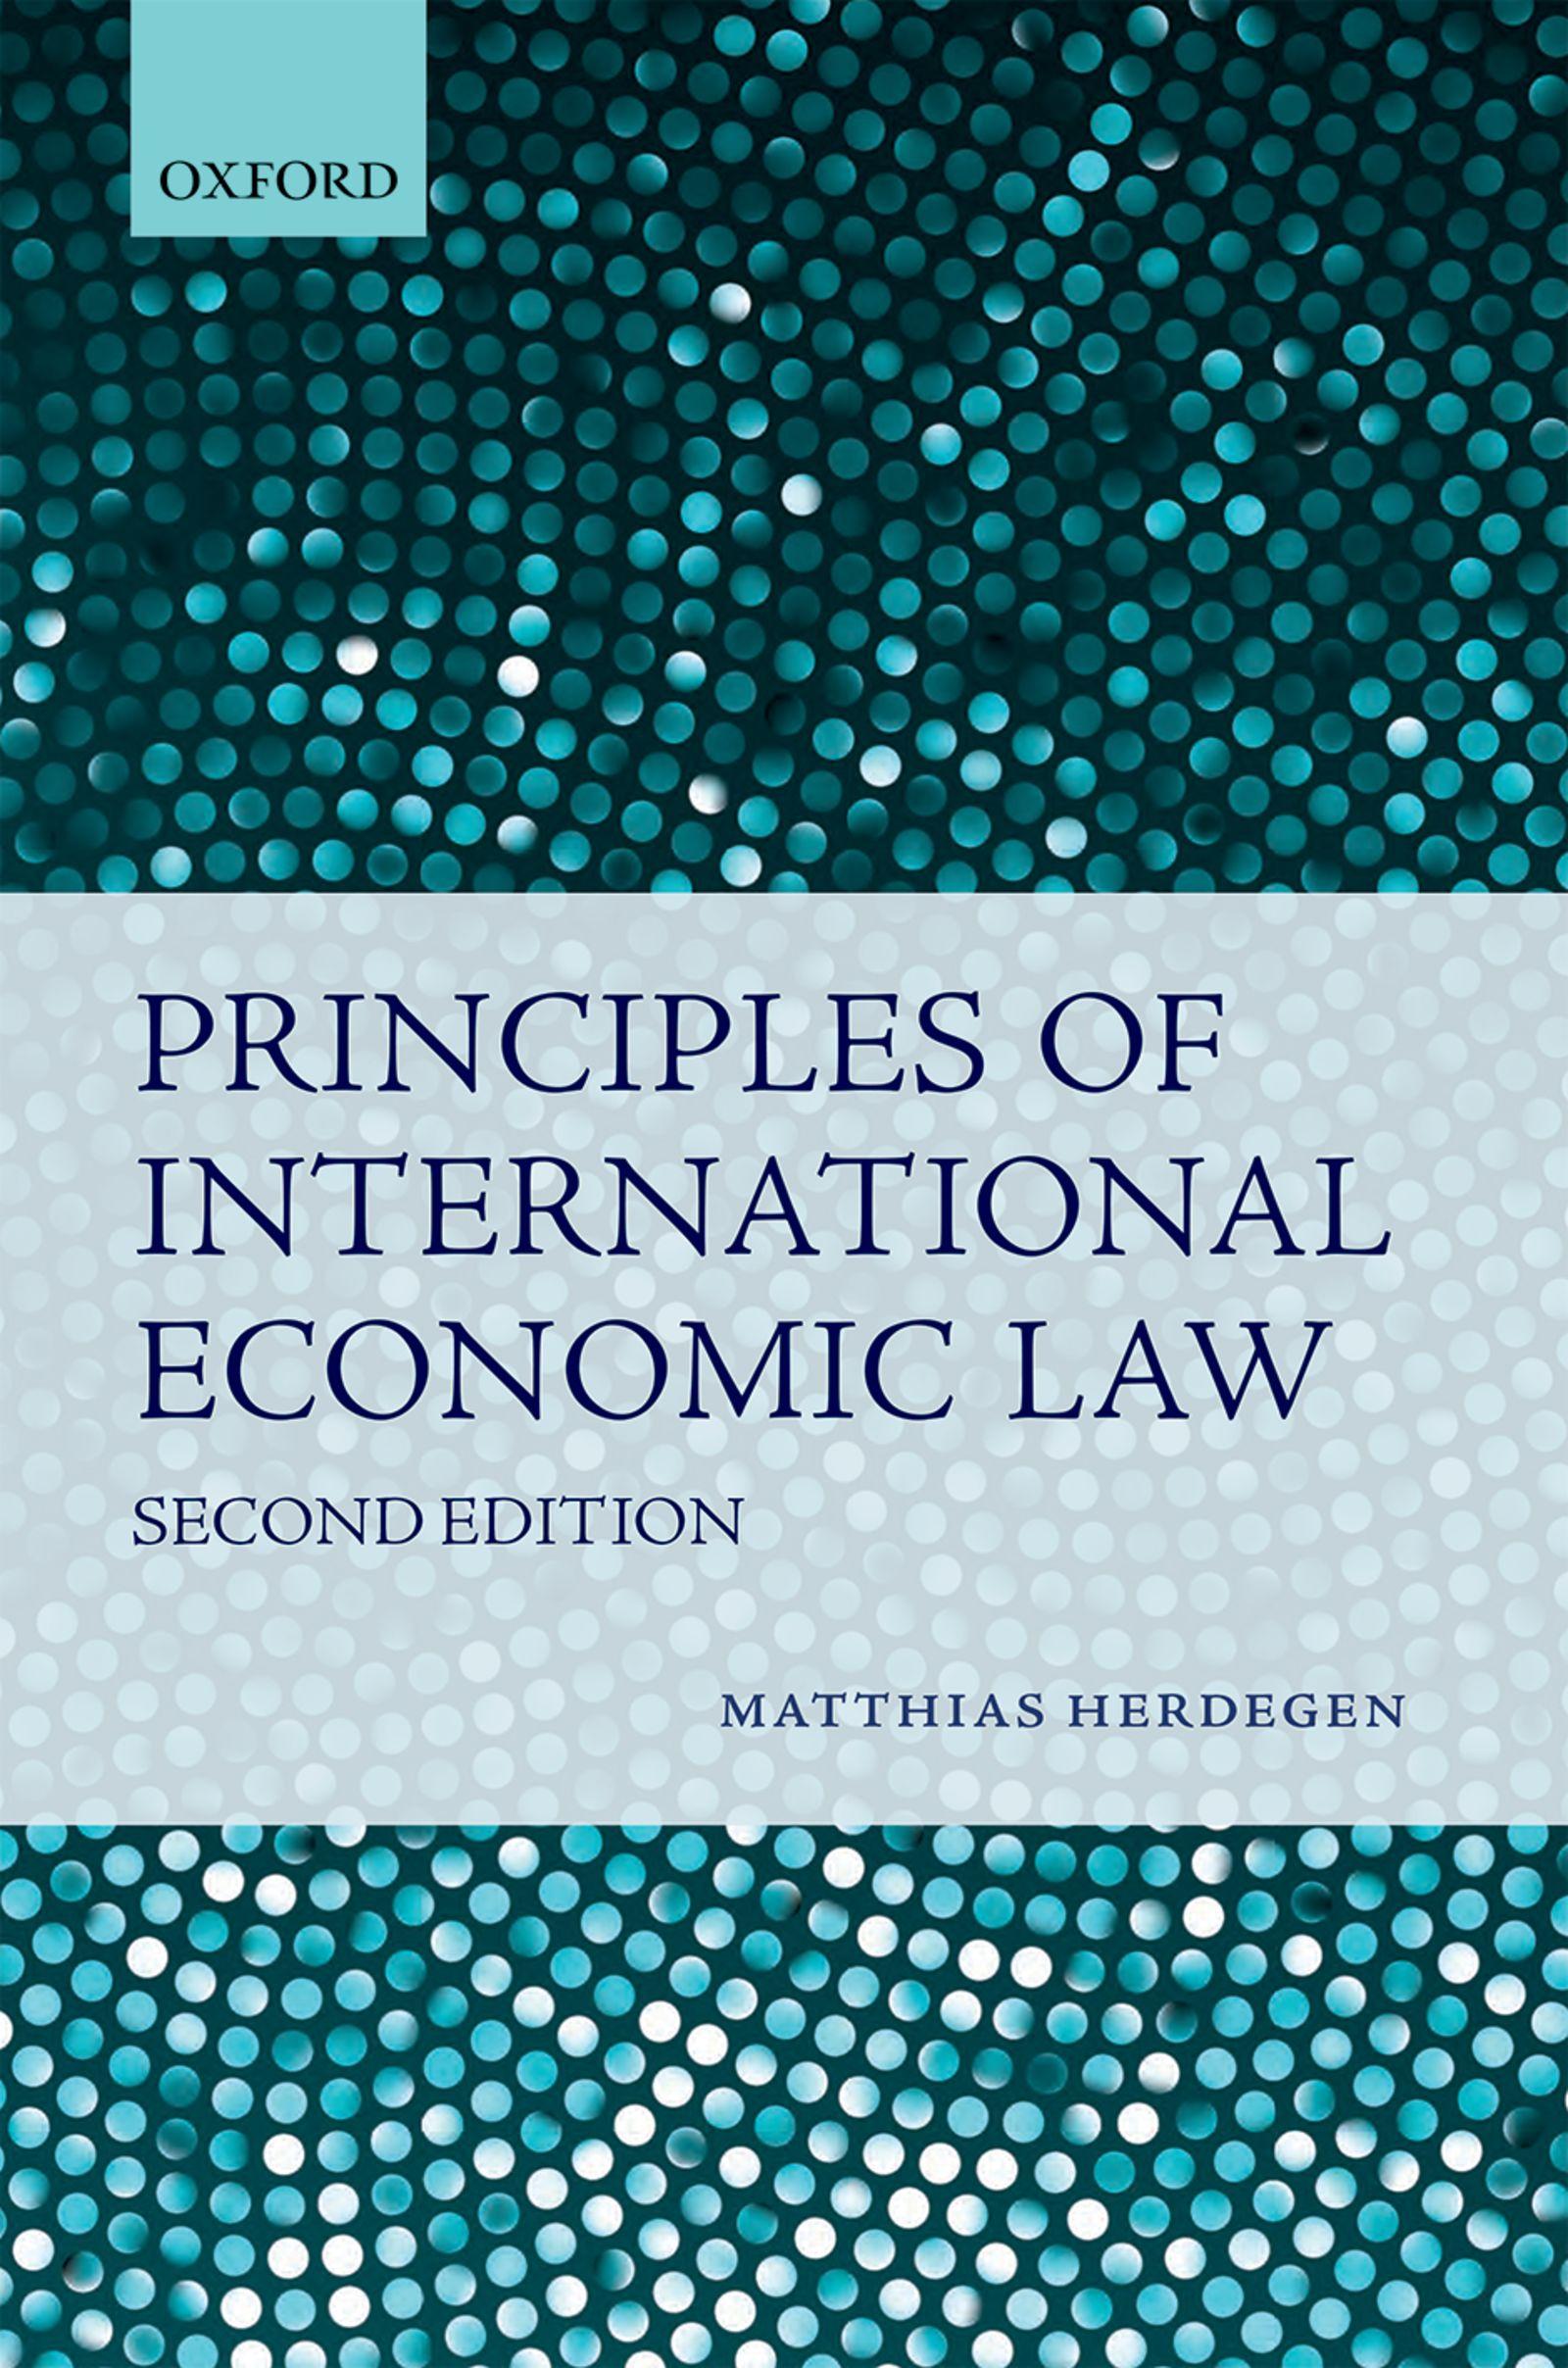 Download Ebook Principles of International Economic Law (2nd ed.) by Matthias Herdegen Pdf